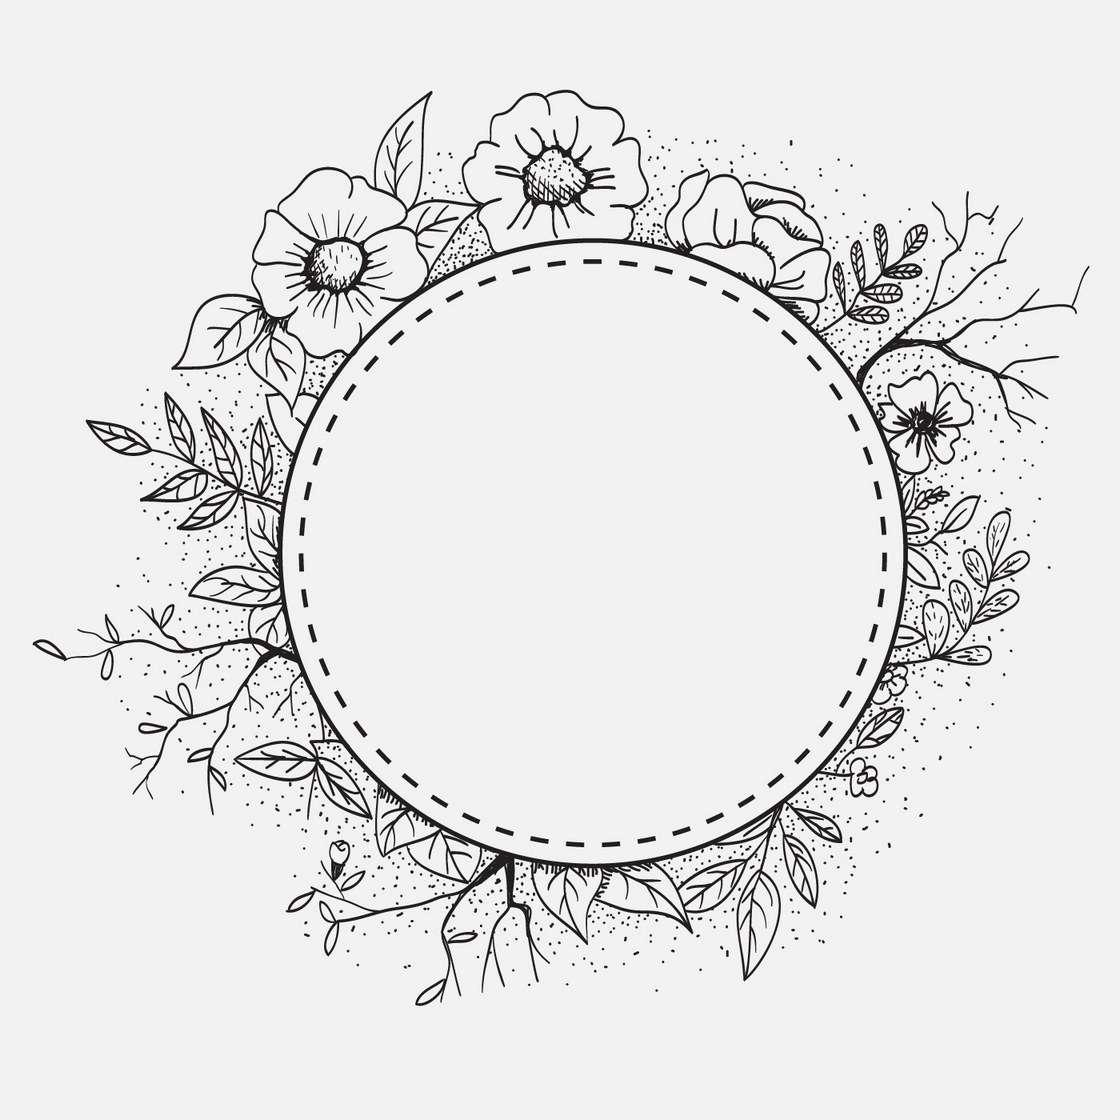 Circular frame with flower